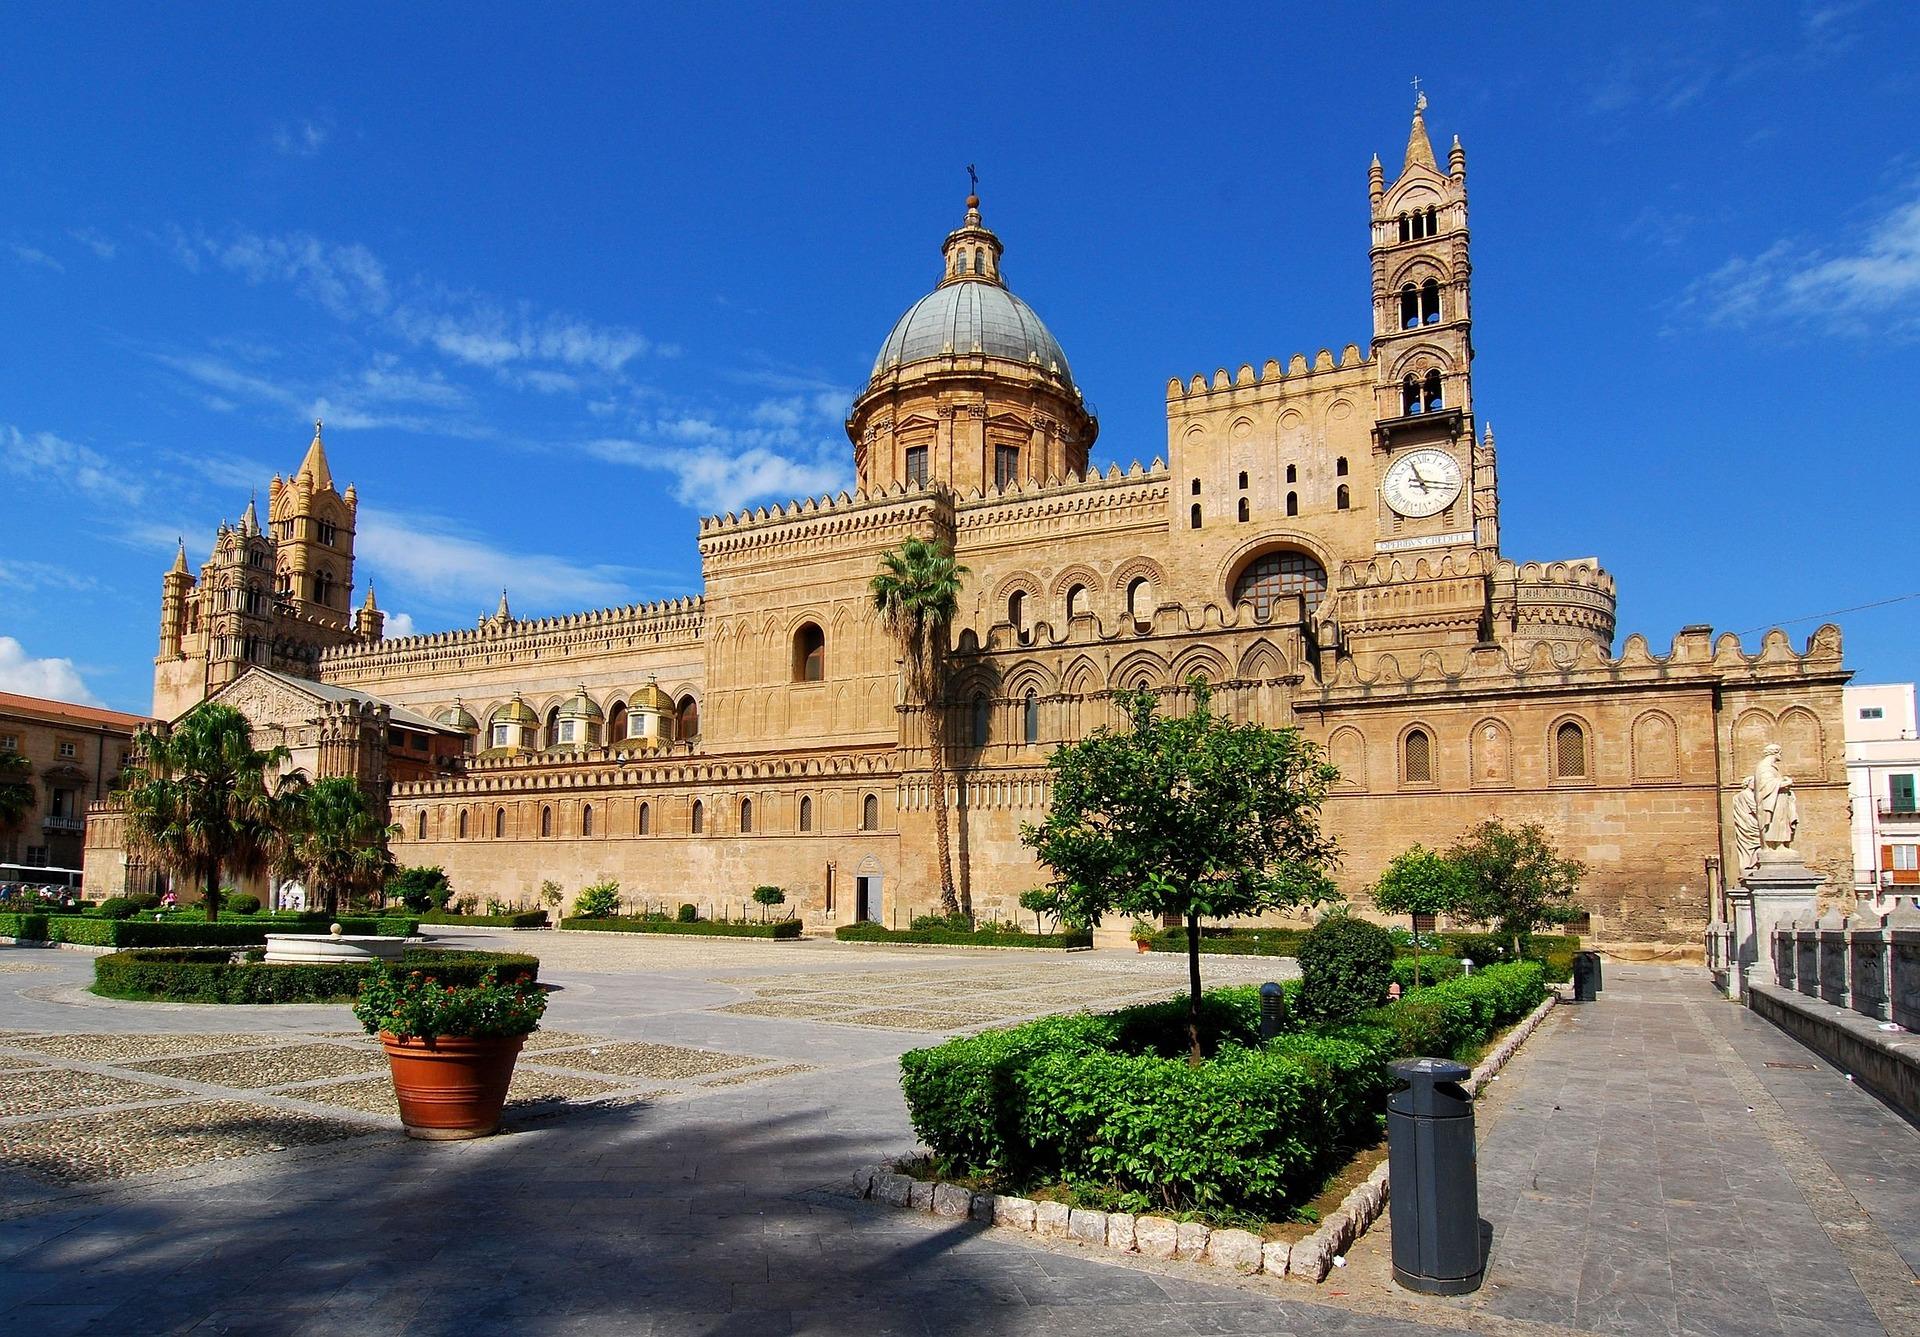 Palermo_CC0.jpg?1545474303